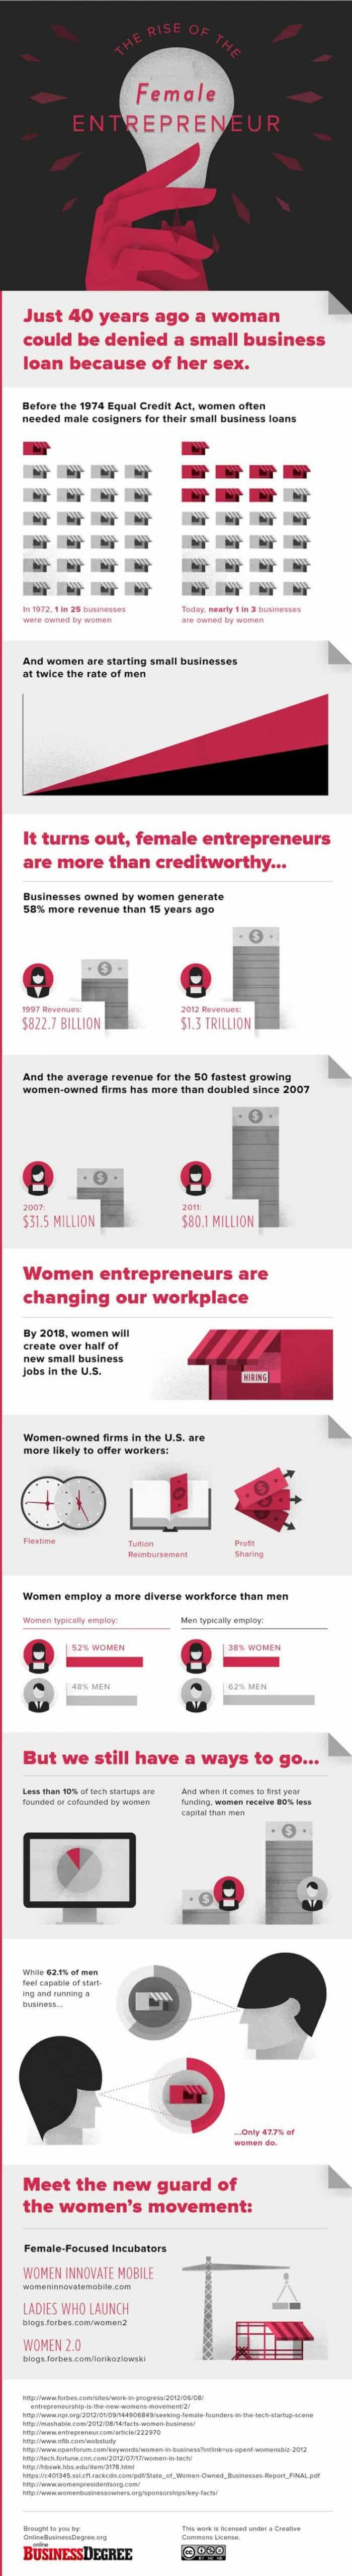 Rise of the Female Entrepreneur Infographic